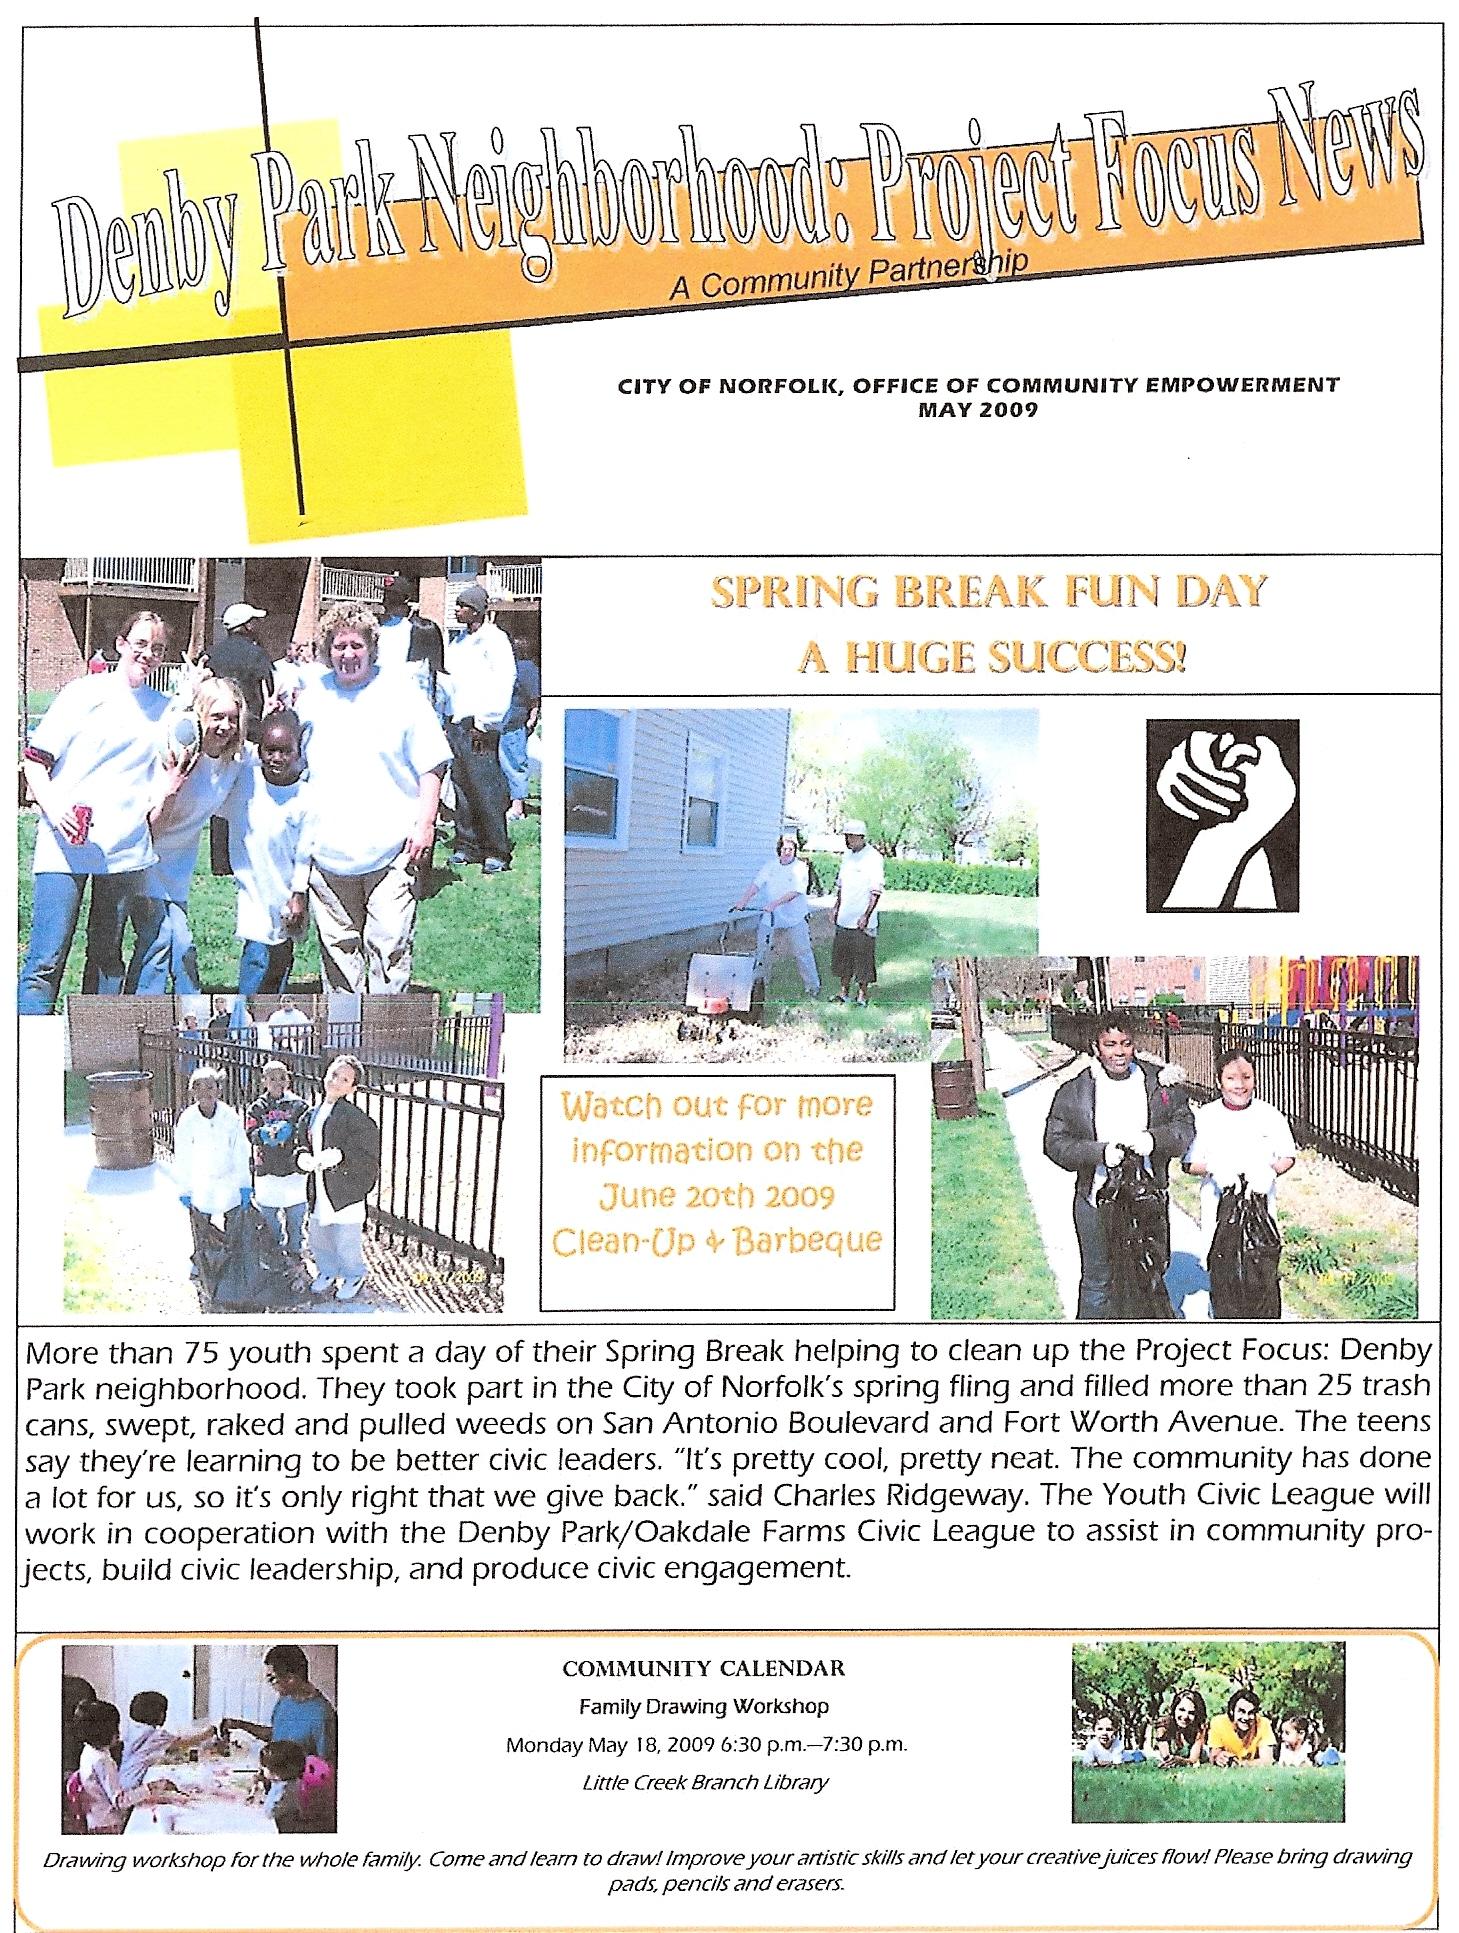 Denby Park Project Focus Newsletter